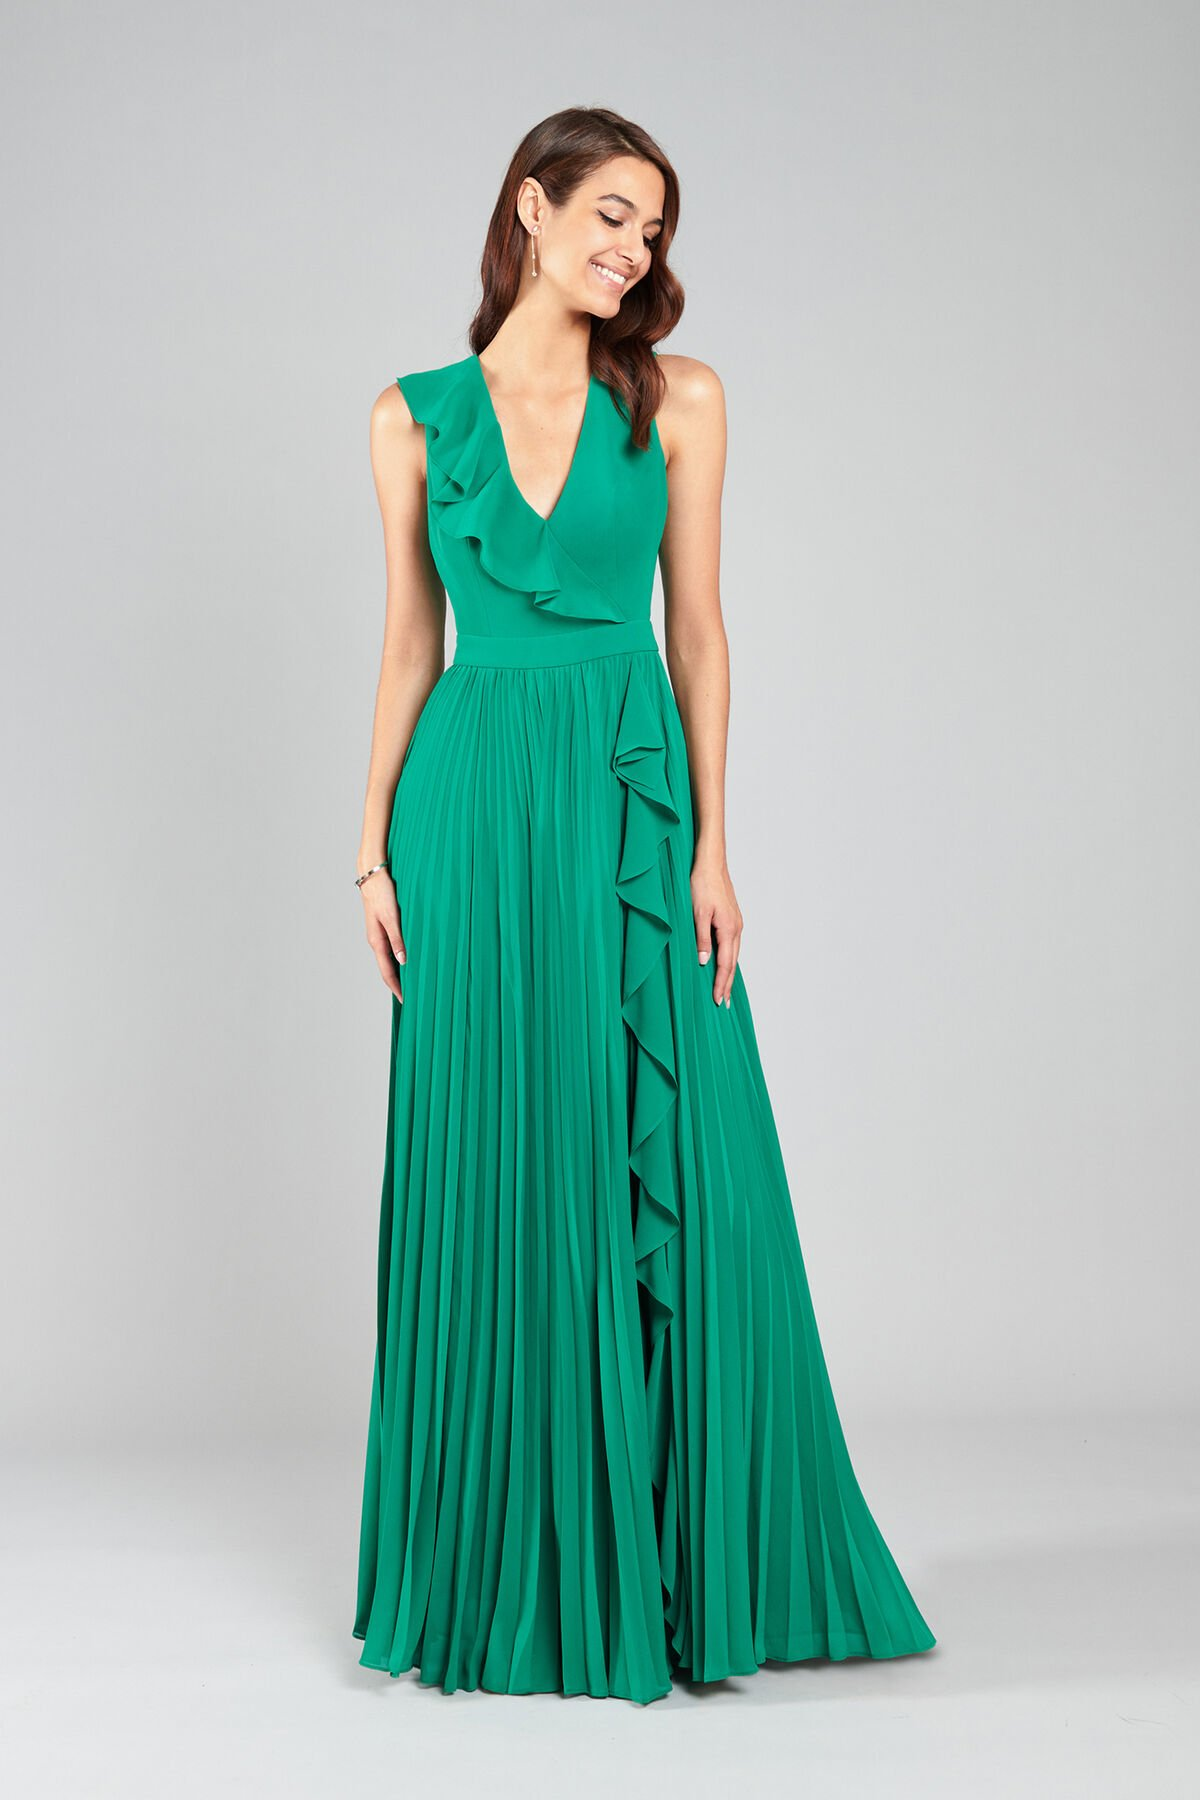 Georgette-Kleid mit Plisseerock